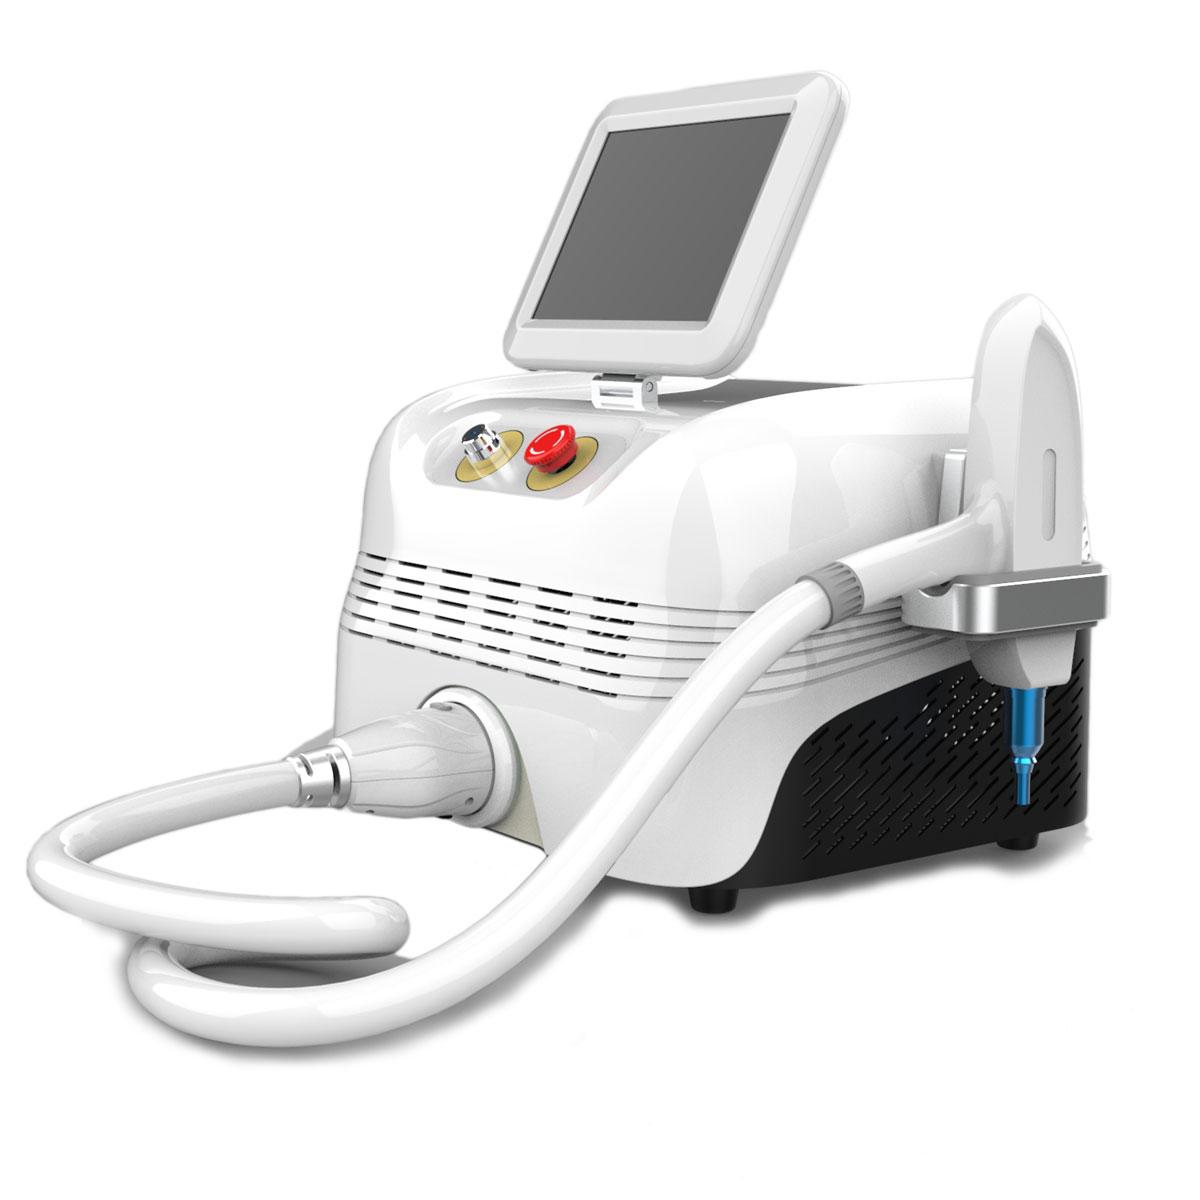 Pro Laser Q-Switched ND:Yag 532/1064 Portatile